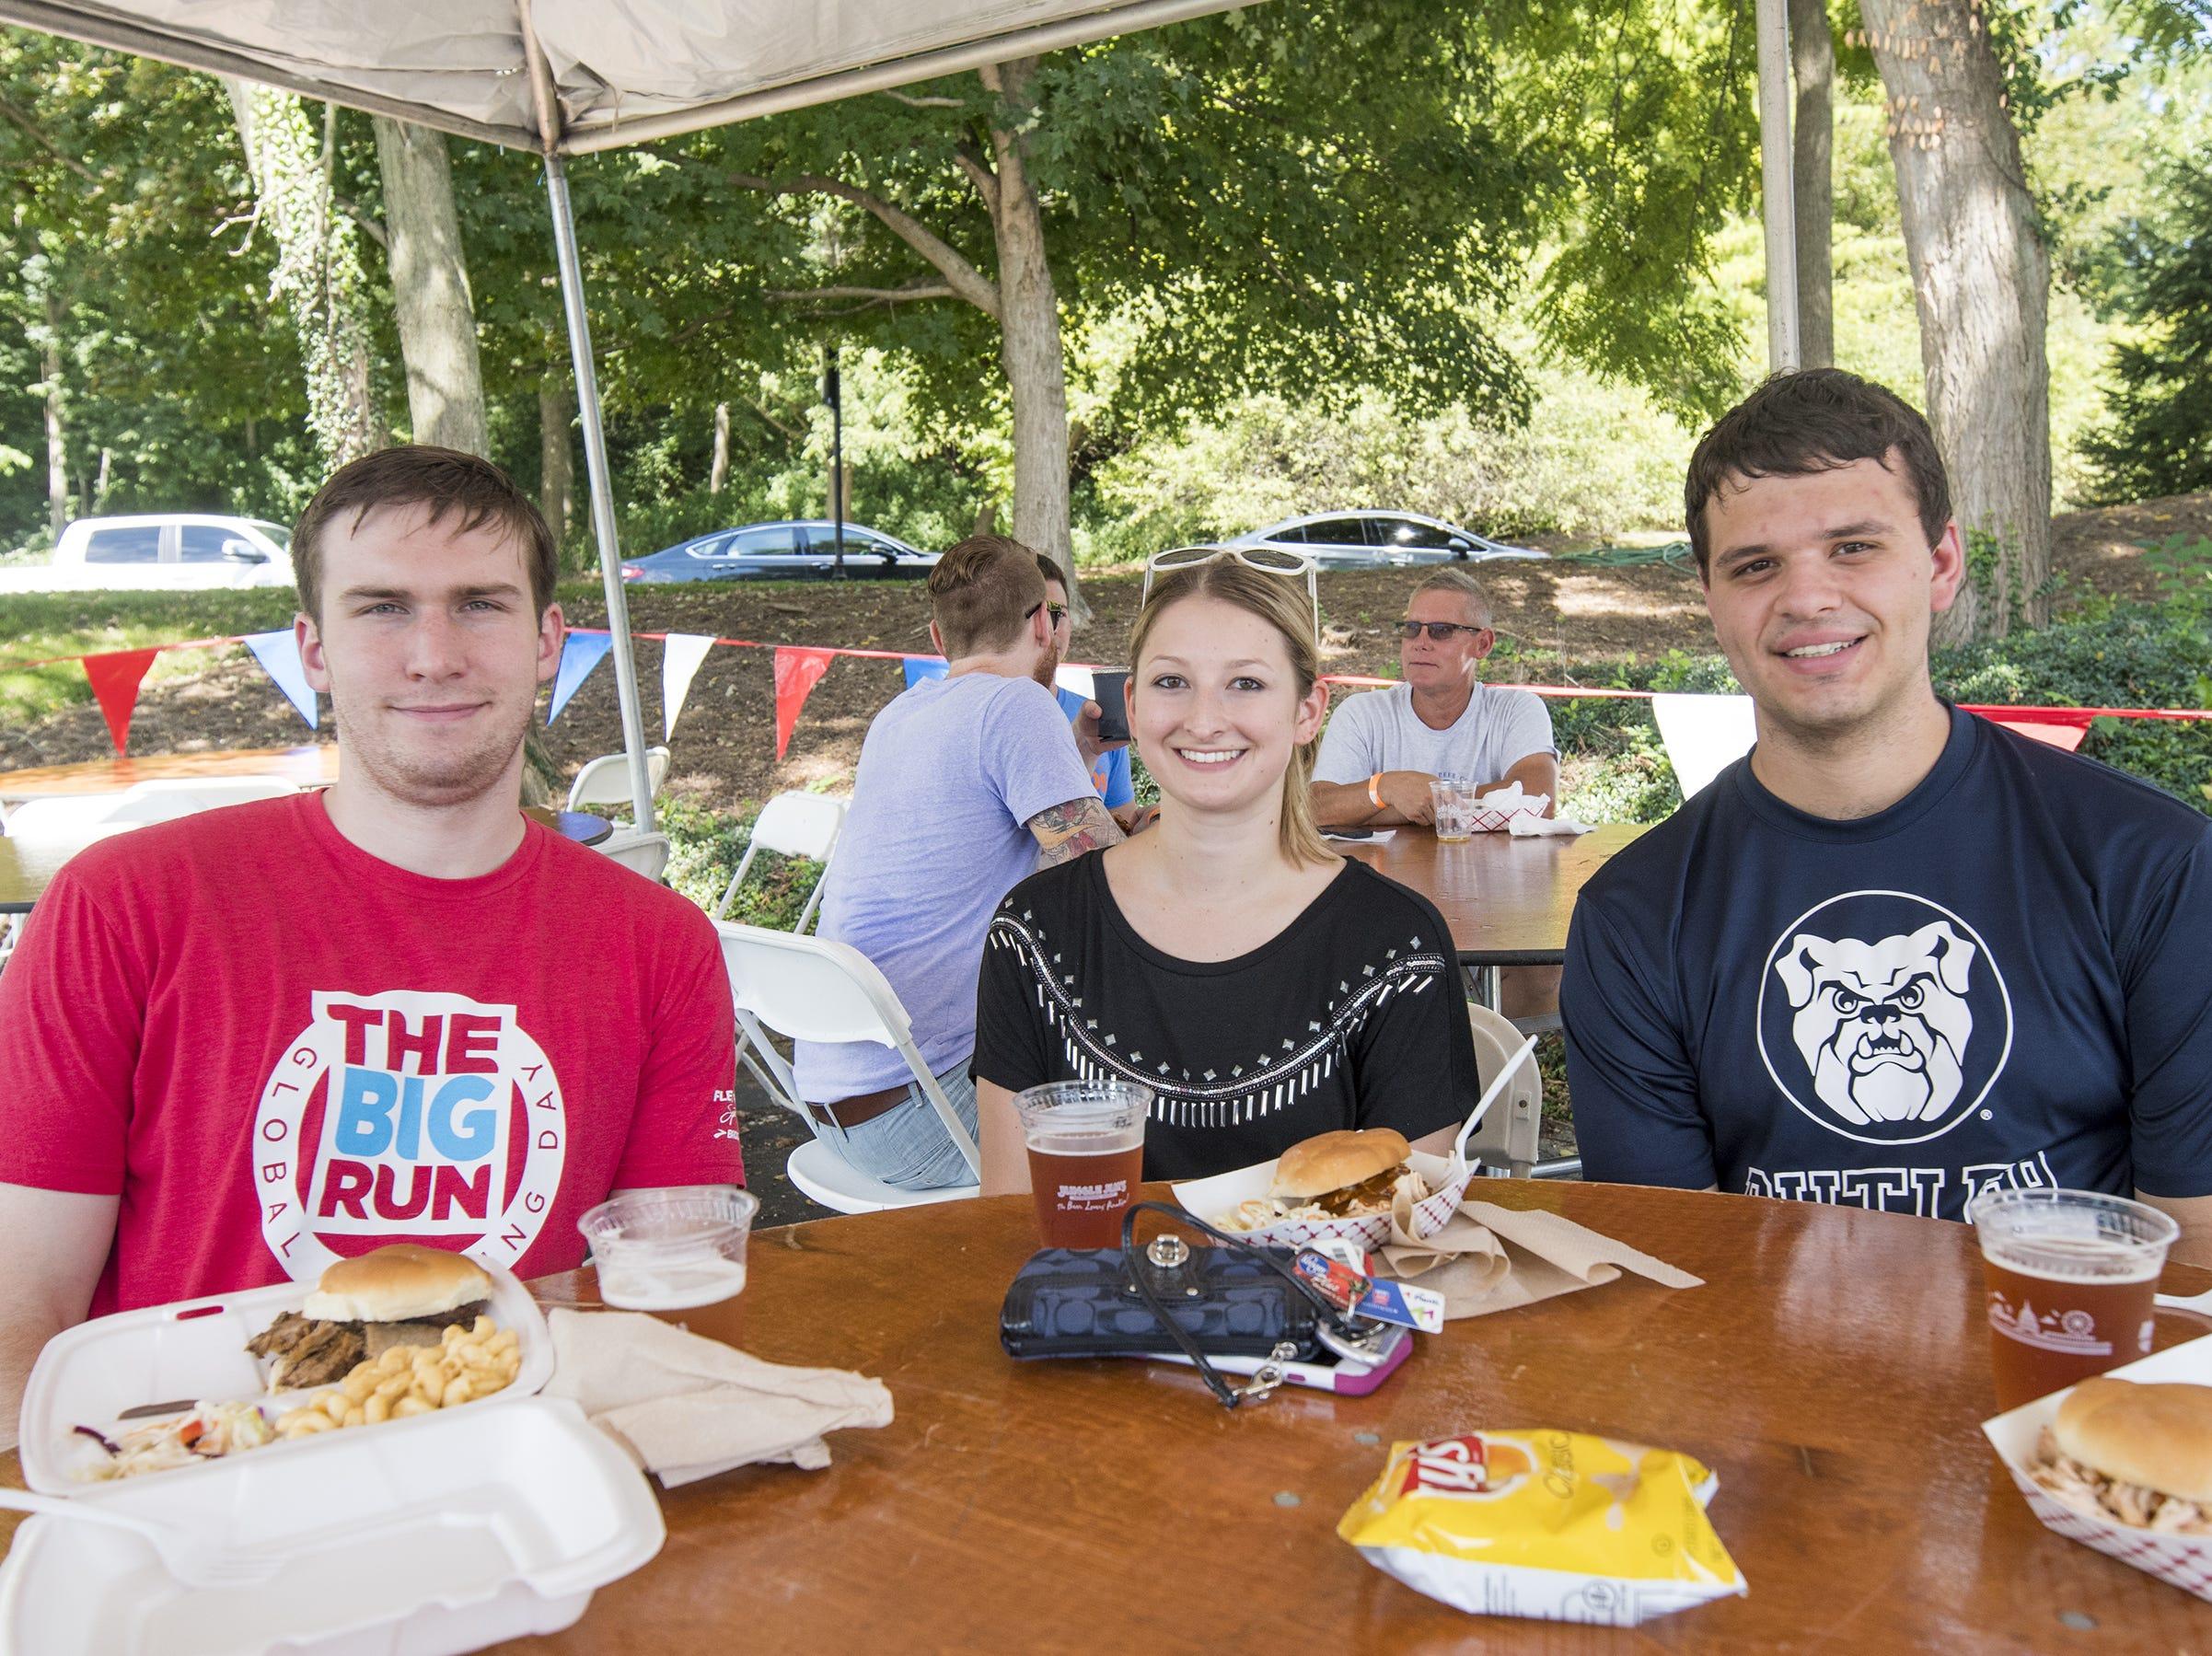 Jackson Dombrowsk, Amanda Gilarski, and Daniel Carr grab some food Fifty Fest at 50 West Brewing Saturday, September 15, 2018 in Cincinnati, Ohio.